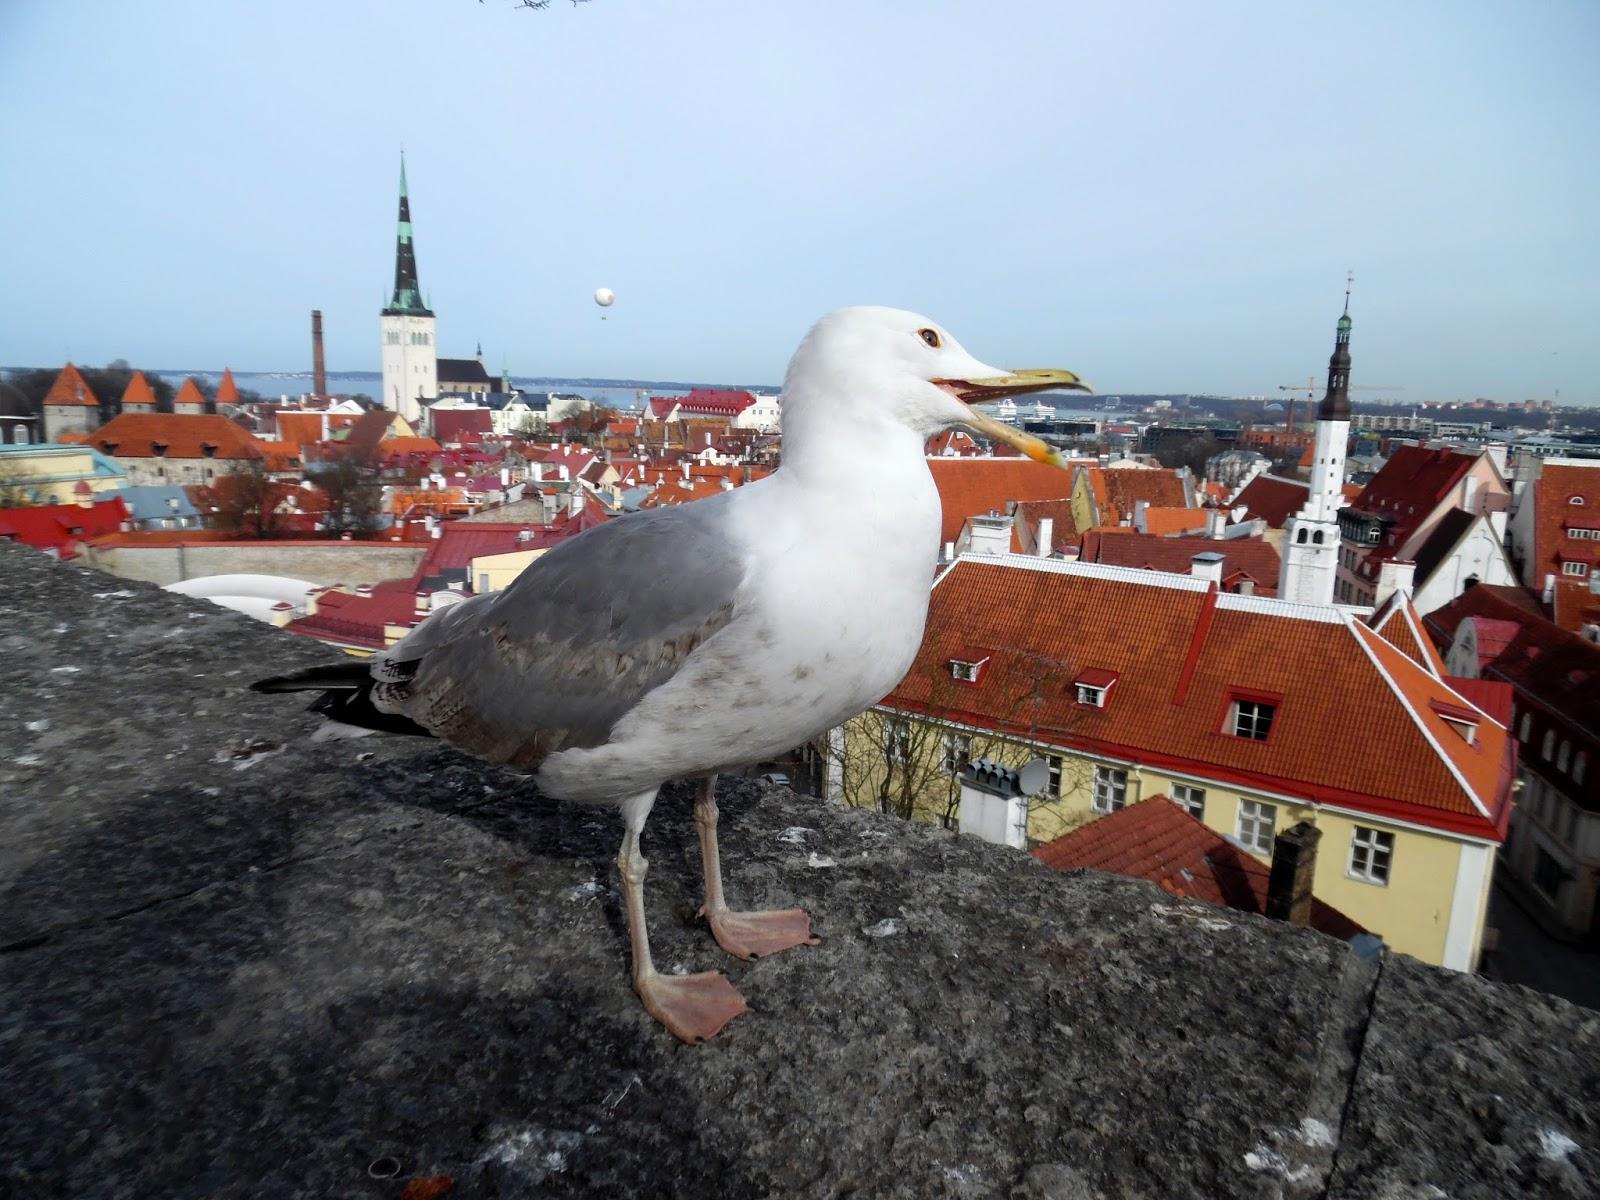 randki Tallinna Trzecia baza randkowa mądra